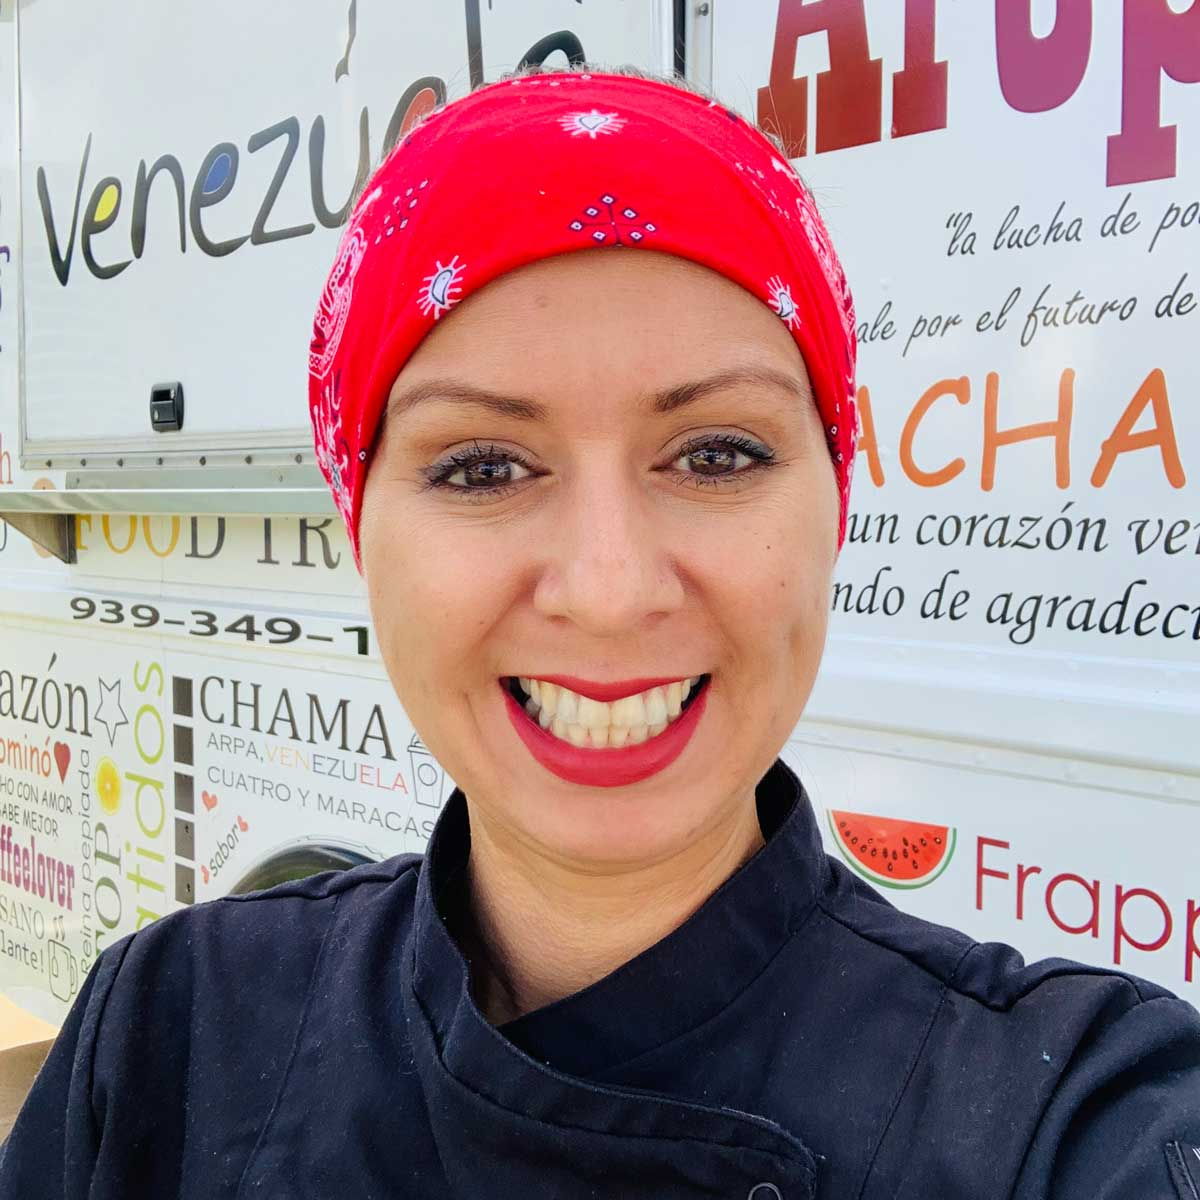 Tamara Rodríguez